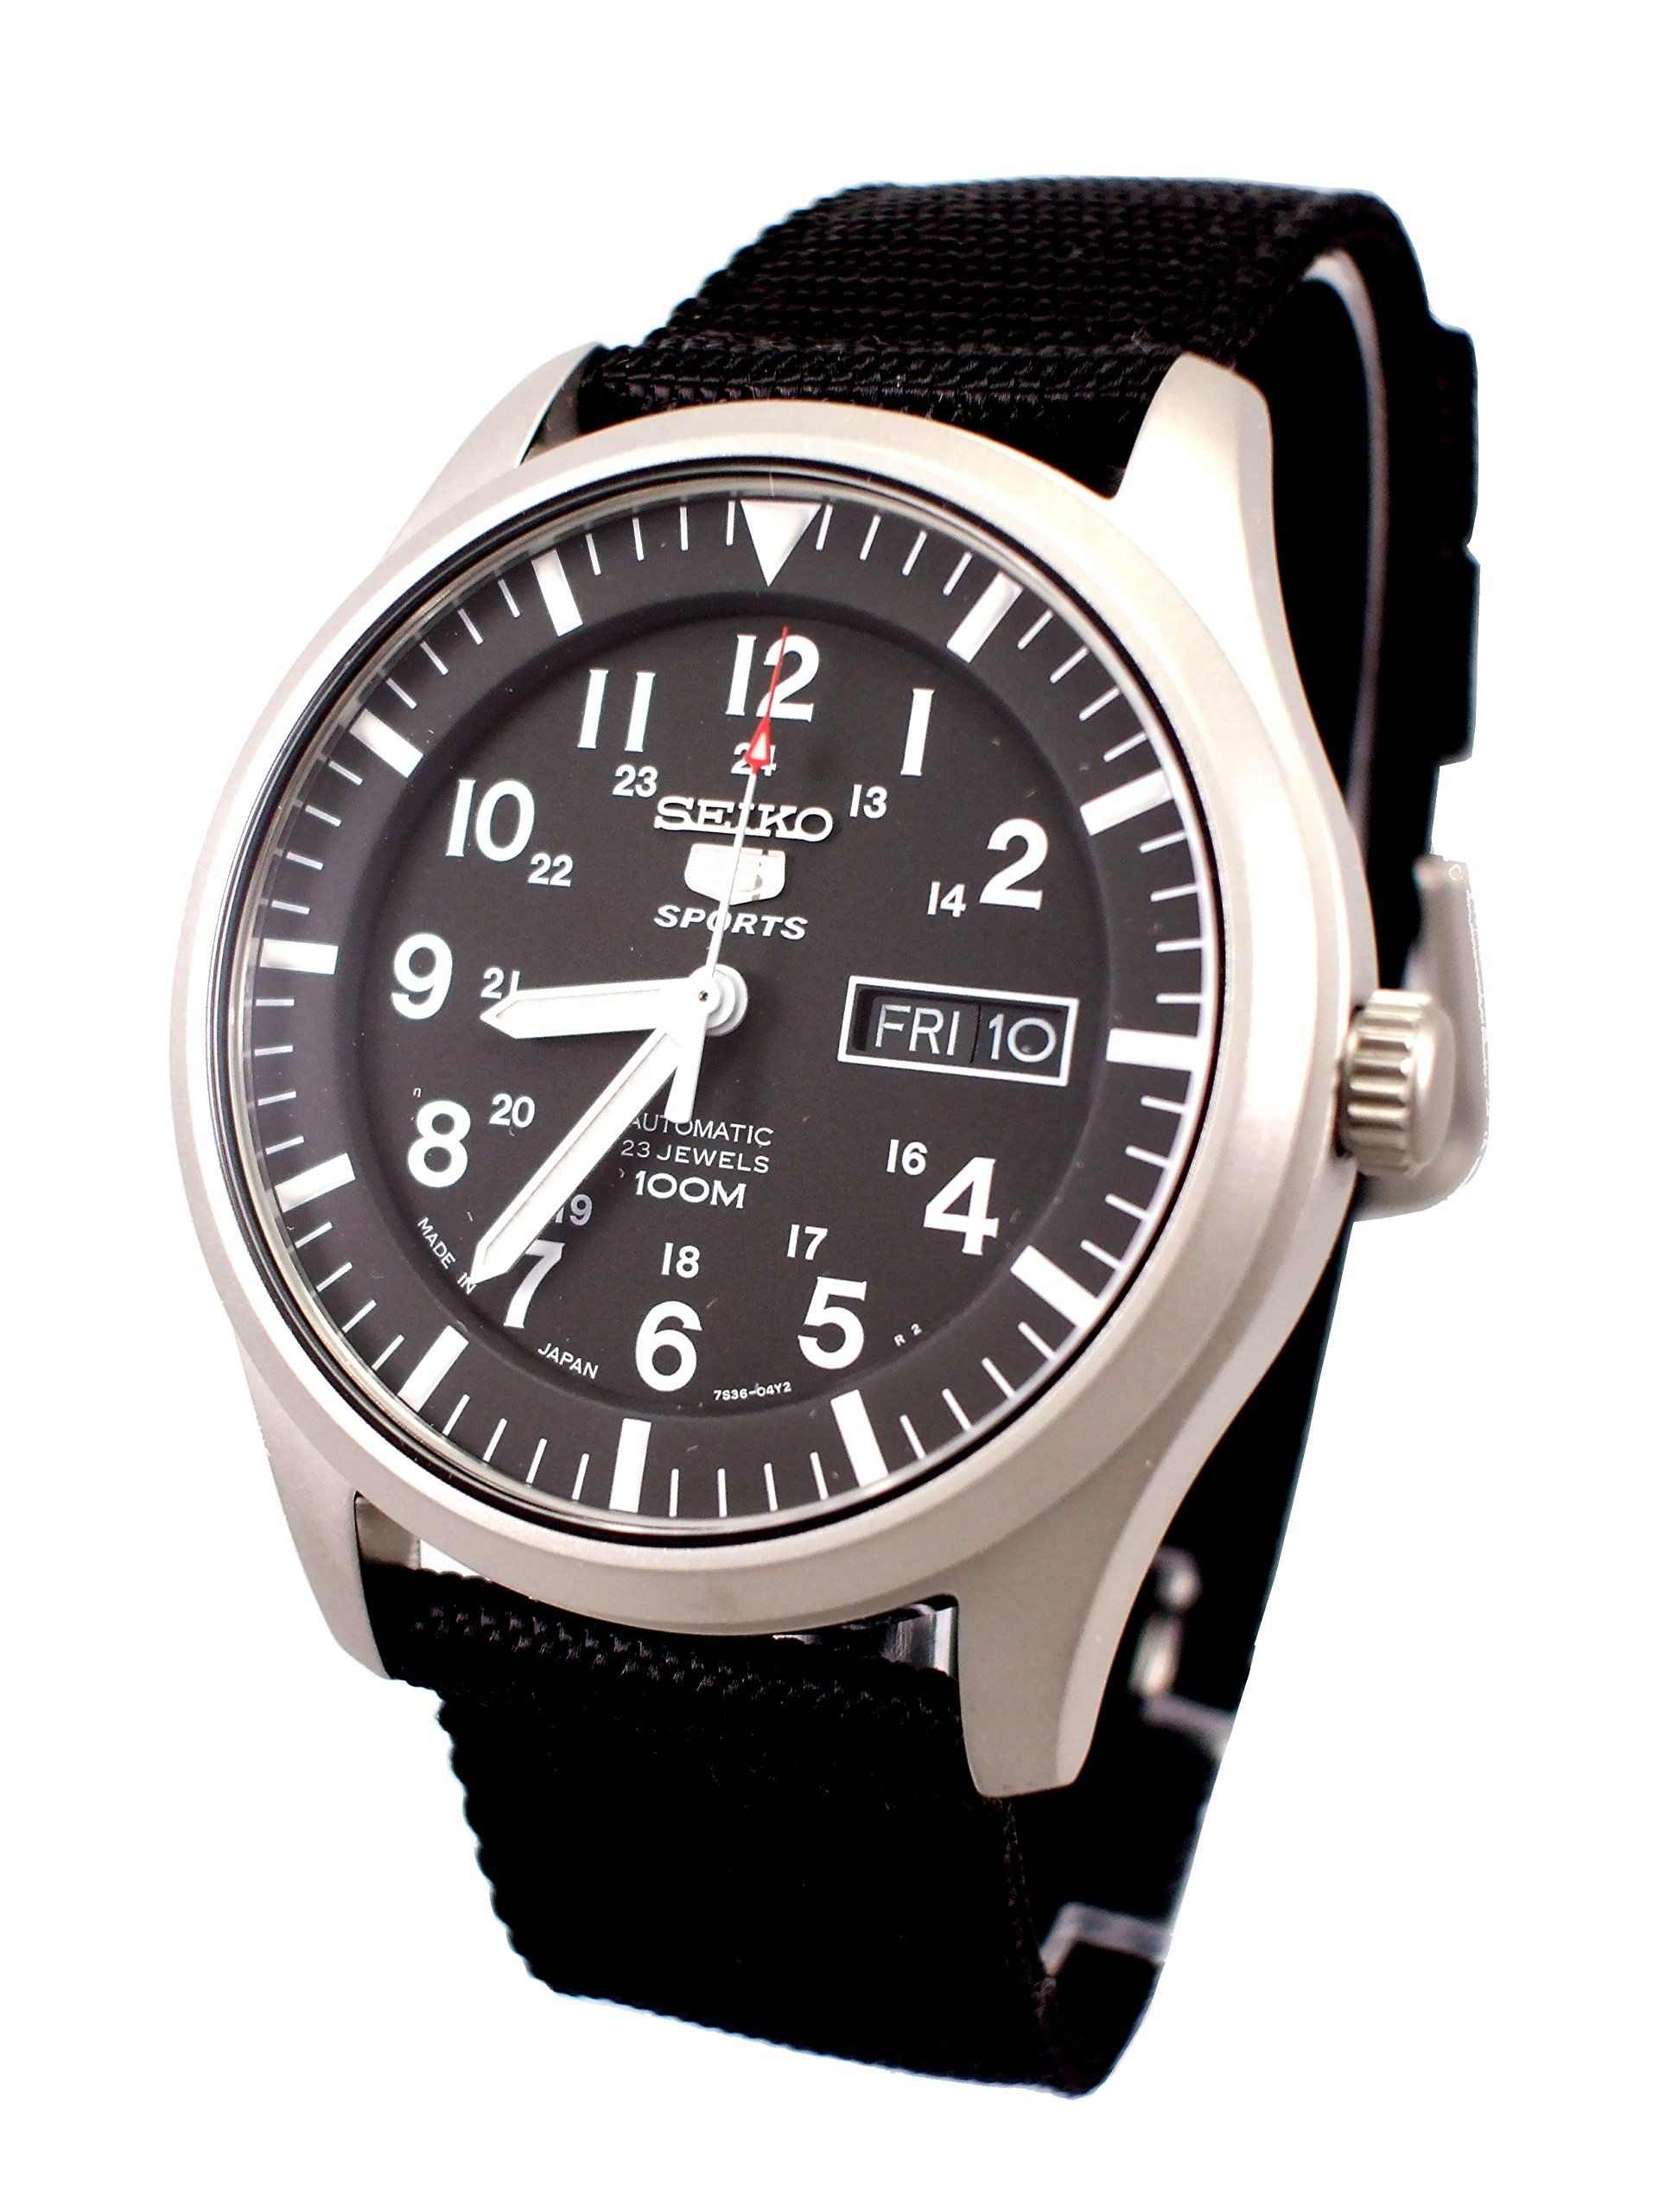 432e3ff33 Seiko 5 Sports Automatic Gents SNZG15J1: Amazon.co.uk: Watches ...